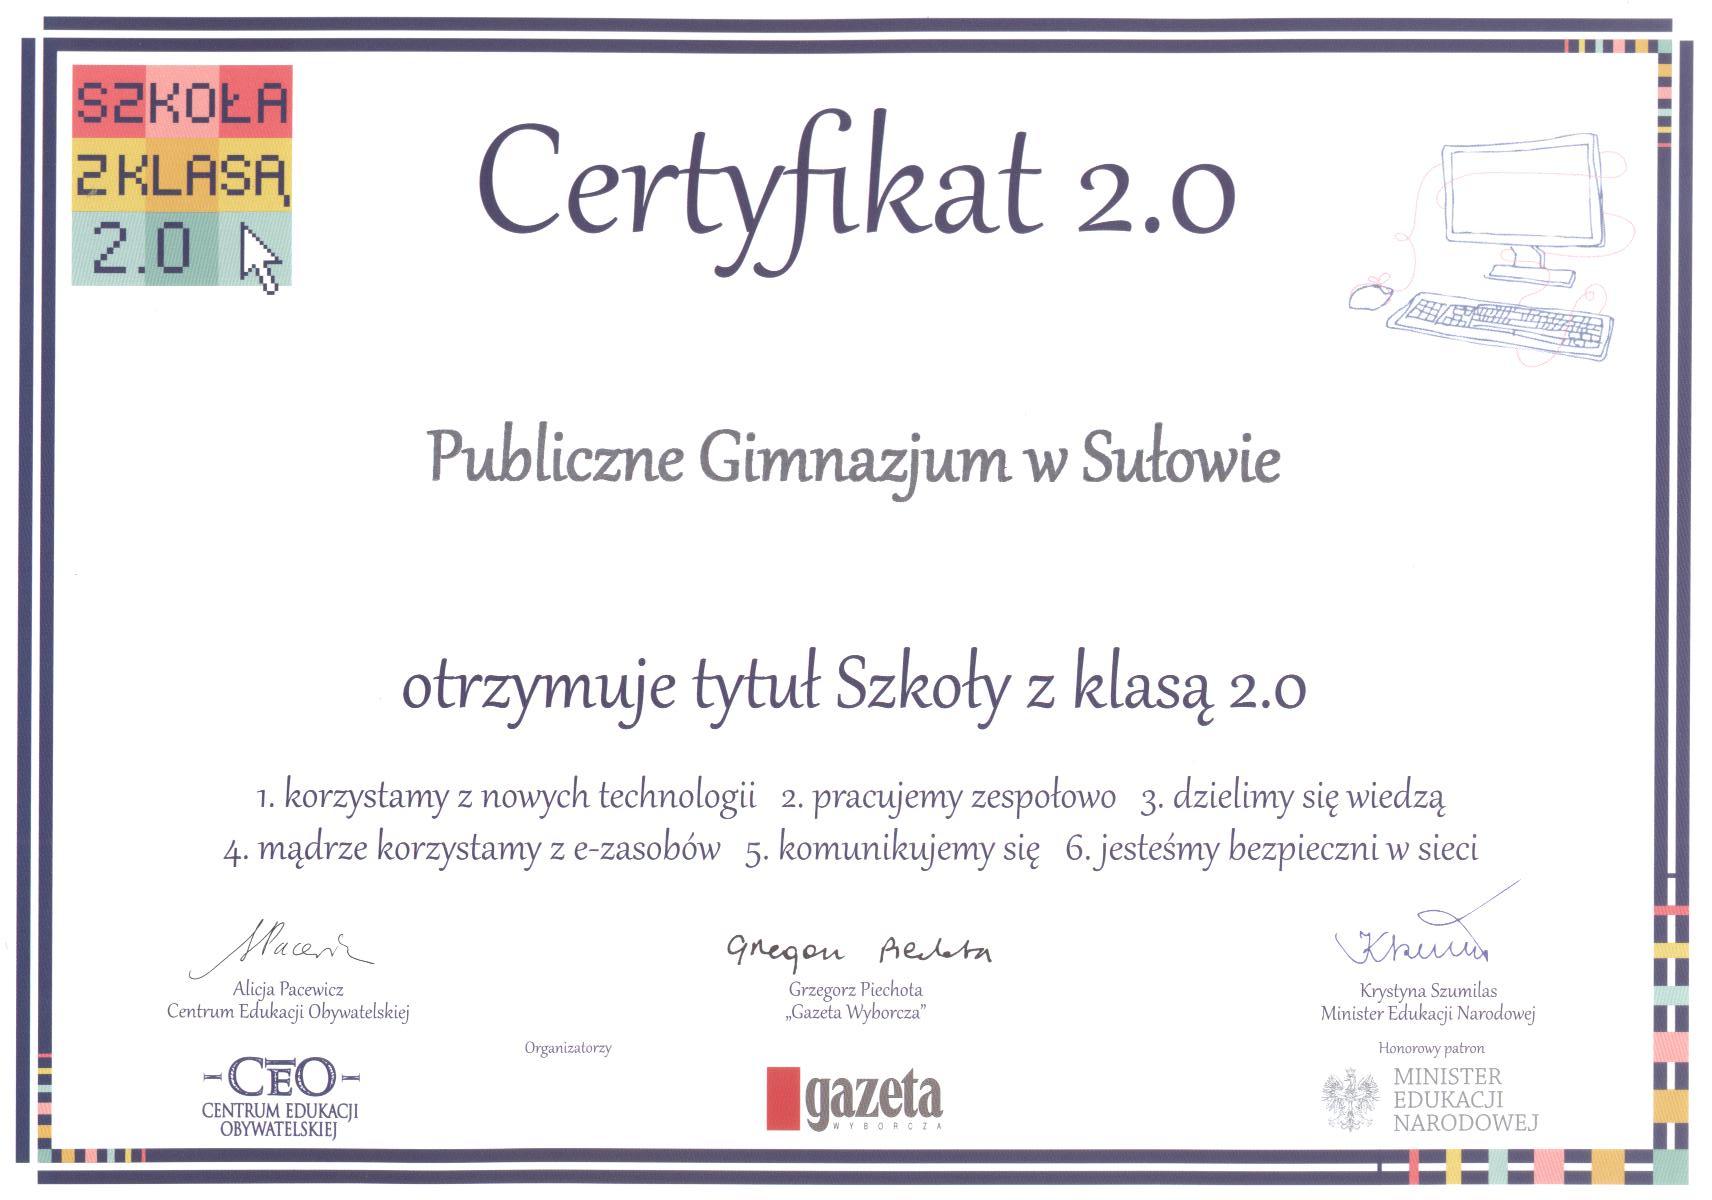 http://zssulow.szkolnastrona.pl/index.php?p=m&idg=zt,52